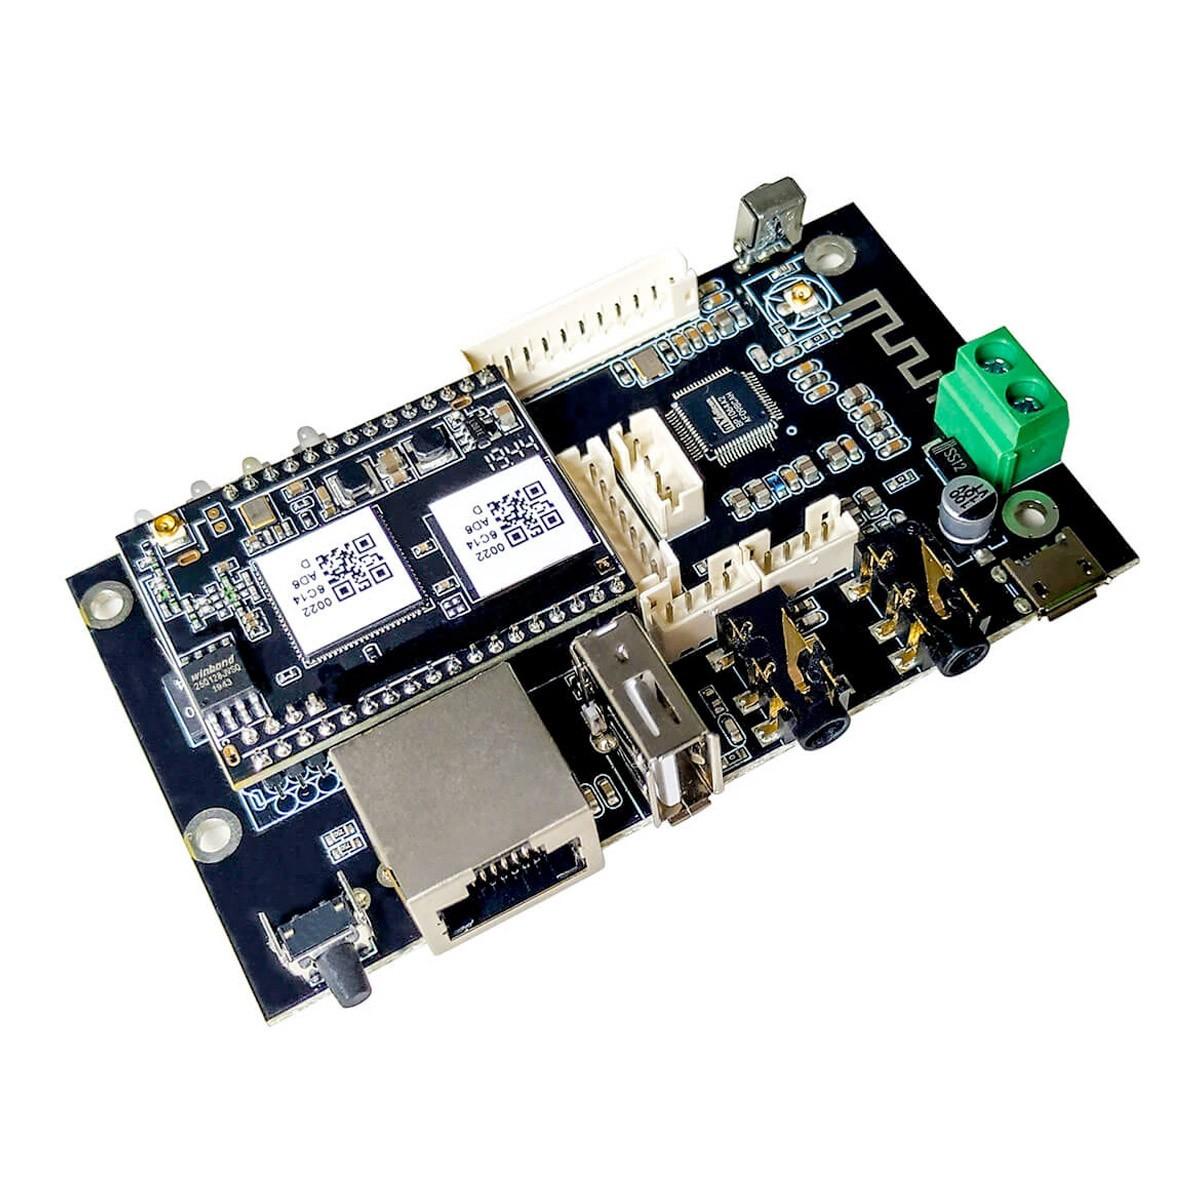 ARYLIC UP2STREAM PRO V3 Receiver WiFi 2.4G Bluetooth 5.0 to I2S SPDIF Multiroom 24bit 192kHz